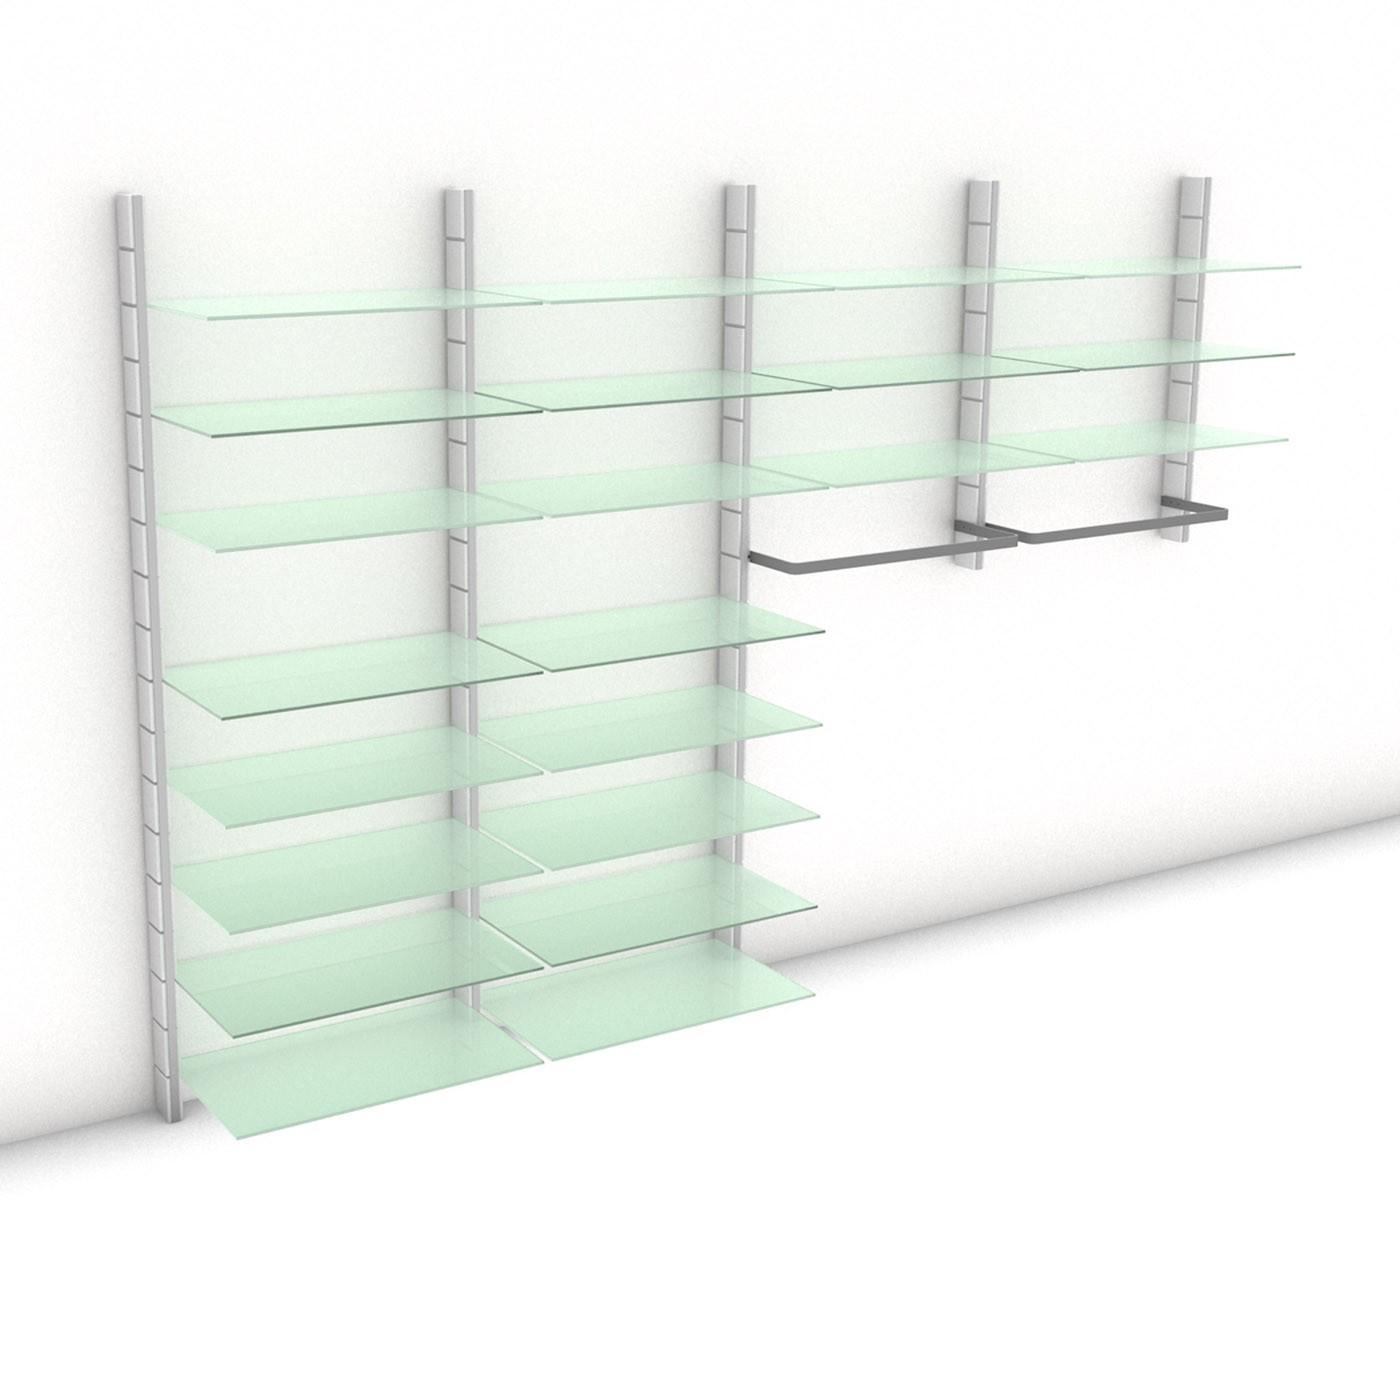 "Begehbarer Kleiderschrank - WALK-IN ""Prime III"" 324 - Maß: 324 x 215,2 x 45 cm (B x H x T)"